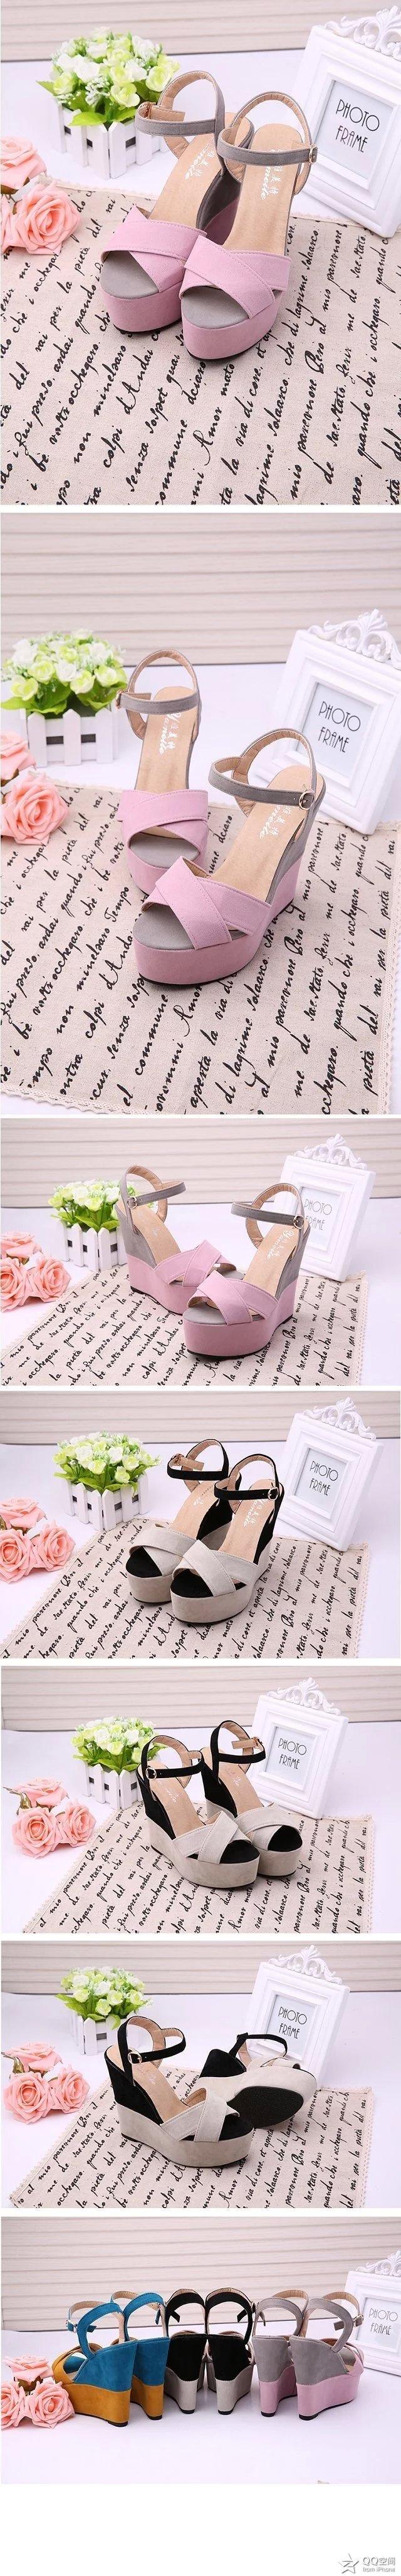 2018 Women Fish Mouth Platform High Heels Wedge Sandals Buckle Slope Sandals Women's High Heel Shoes 4 Online shopping Bangladesh